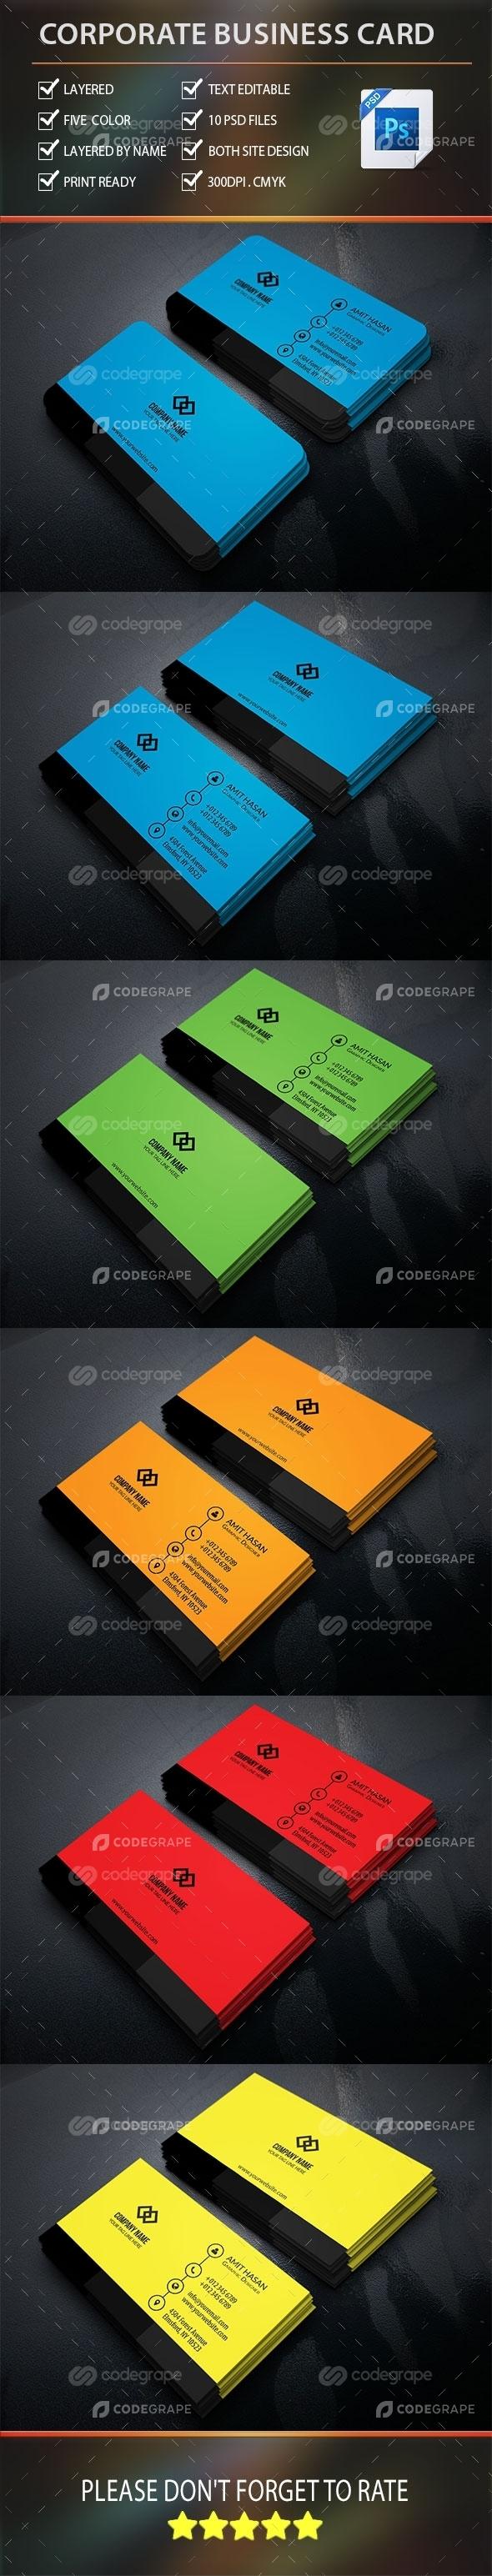 Creative Corporate Business Card vol : 4.0